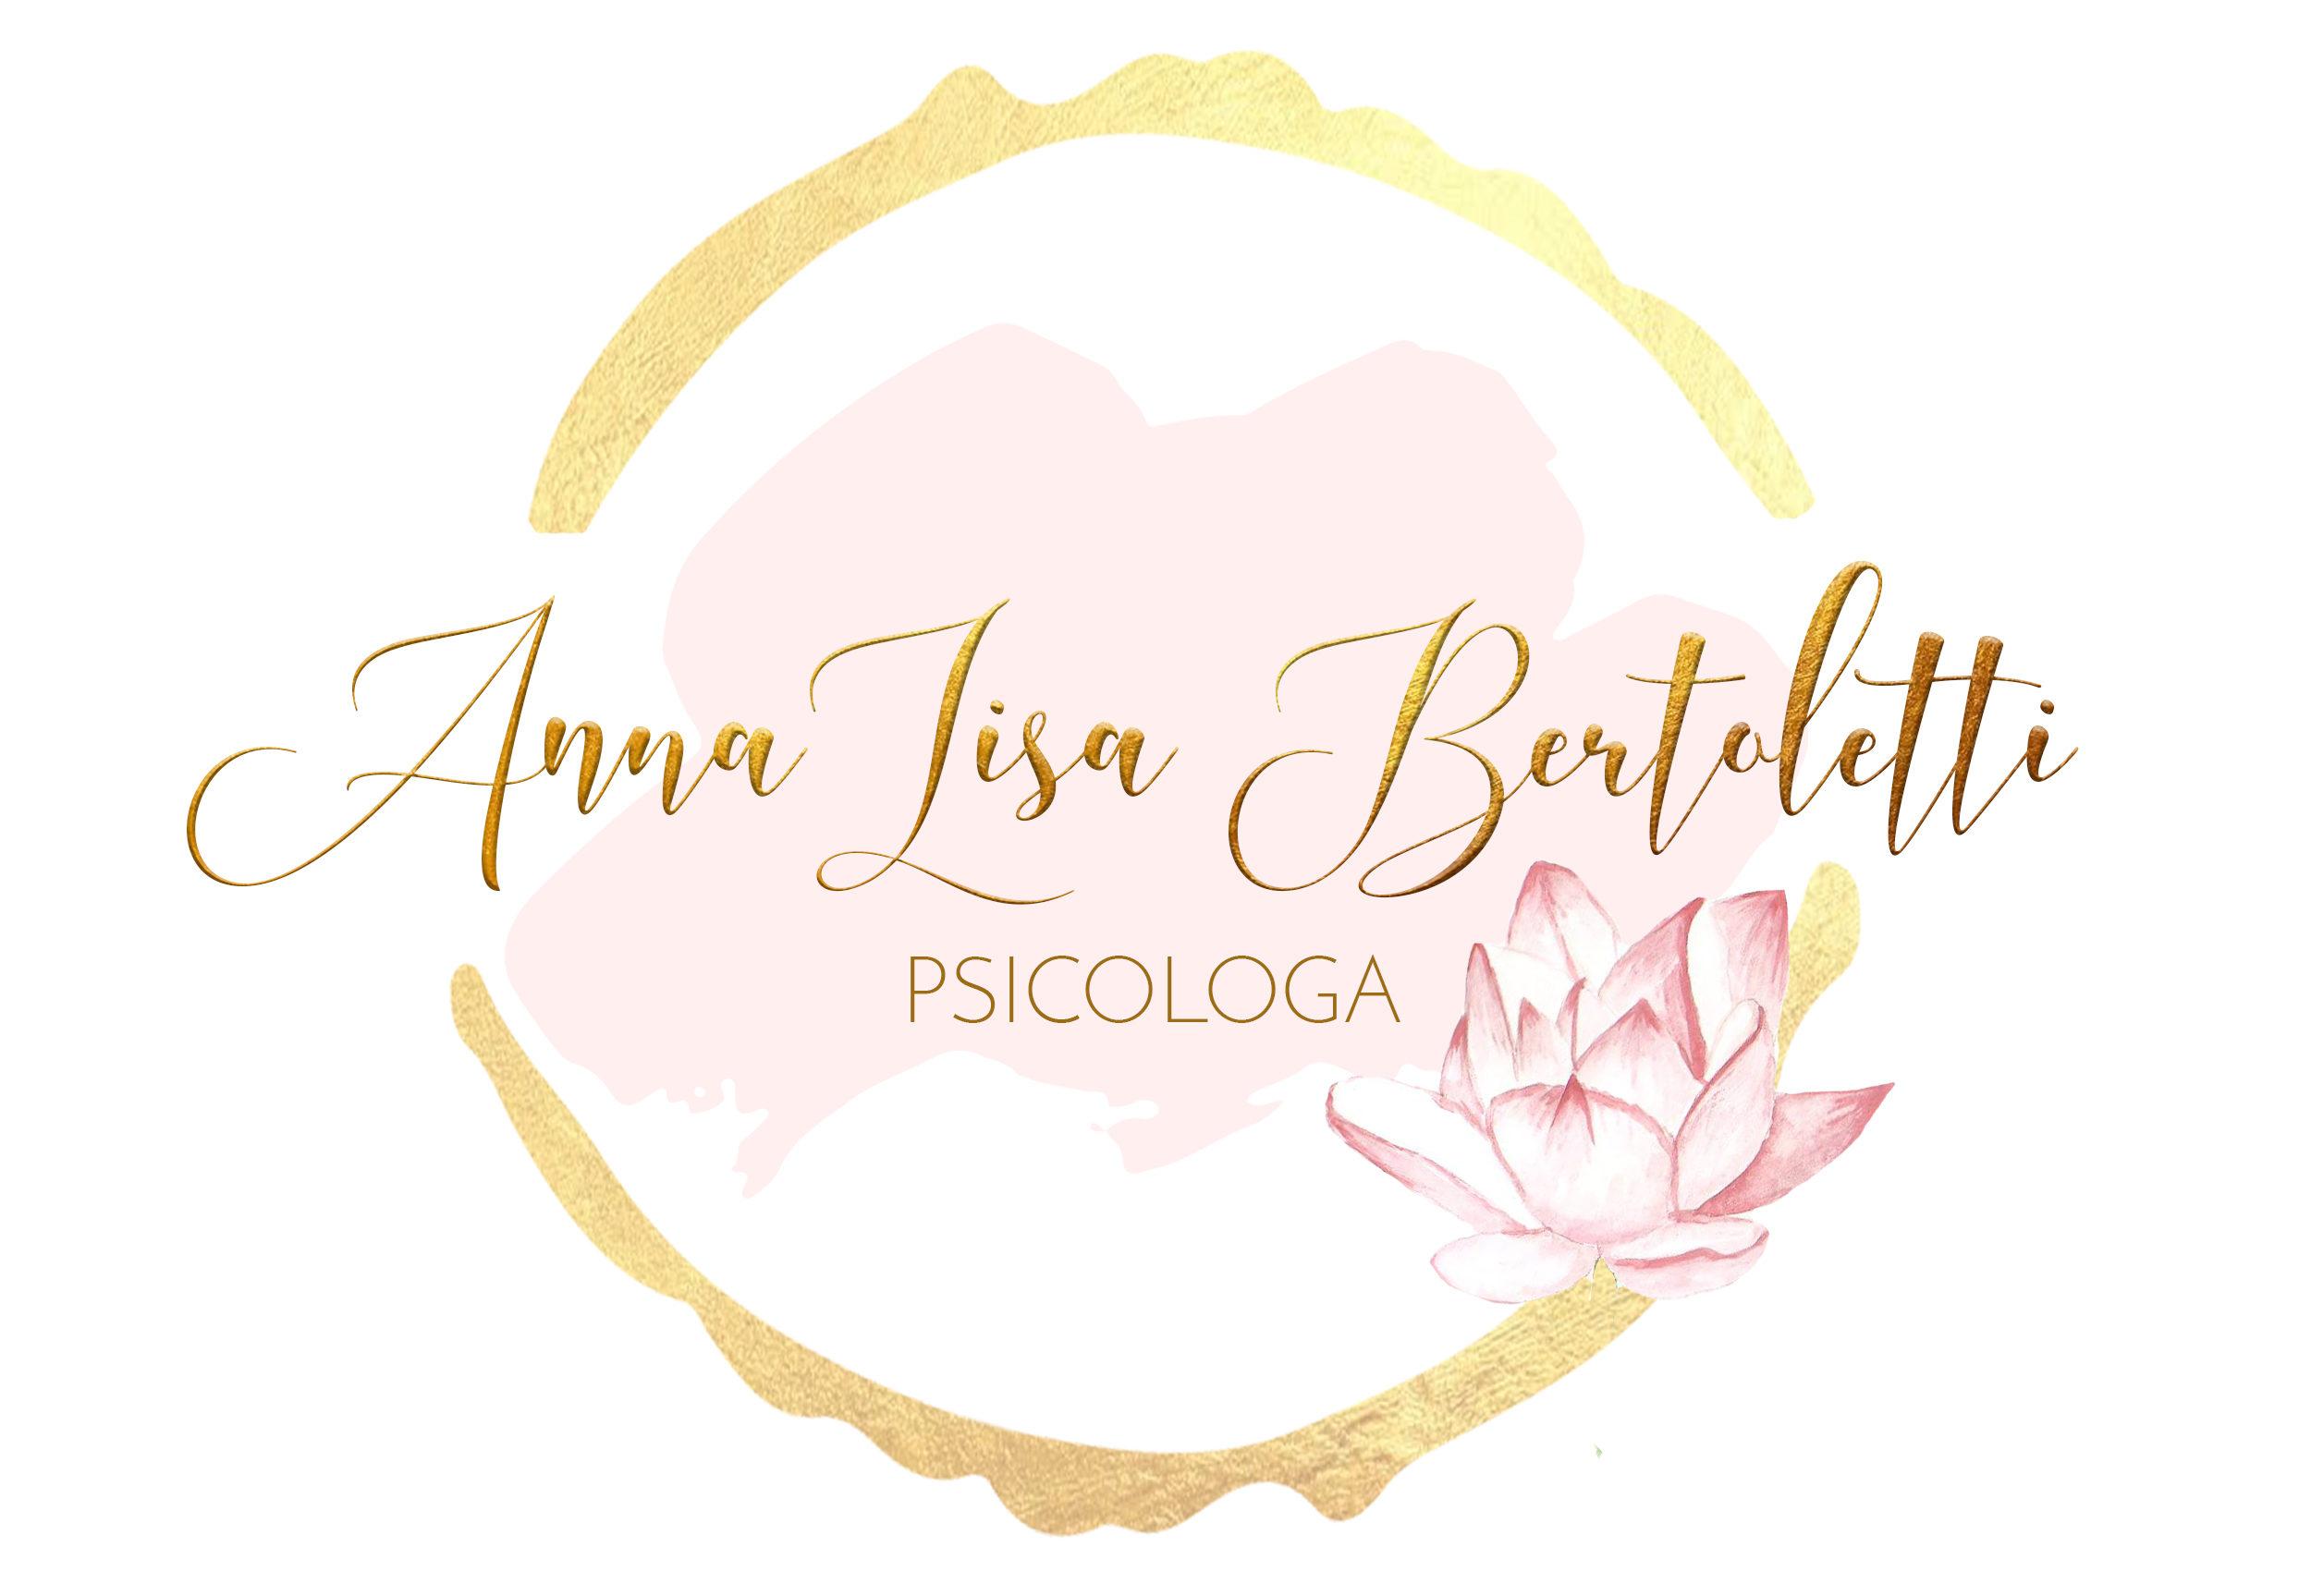 Dott.ssa AnnaLisa Bertoletti Psicologa